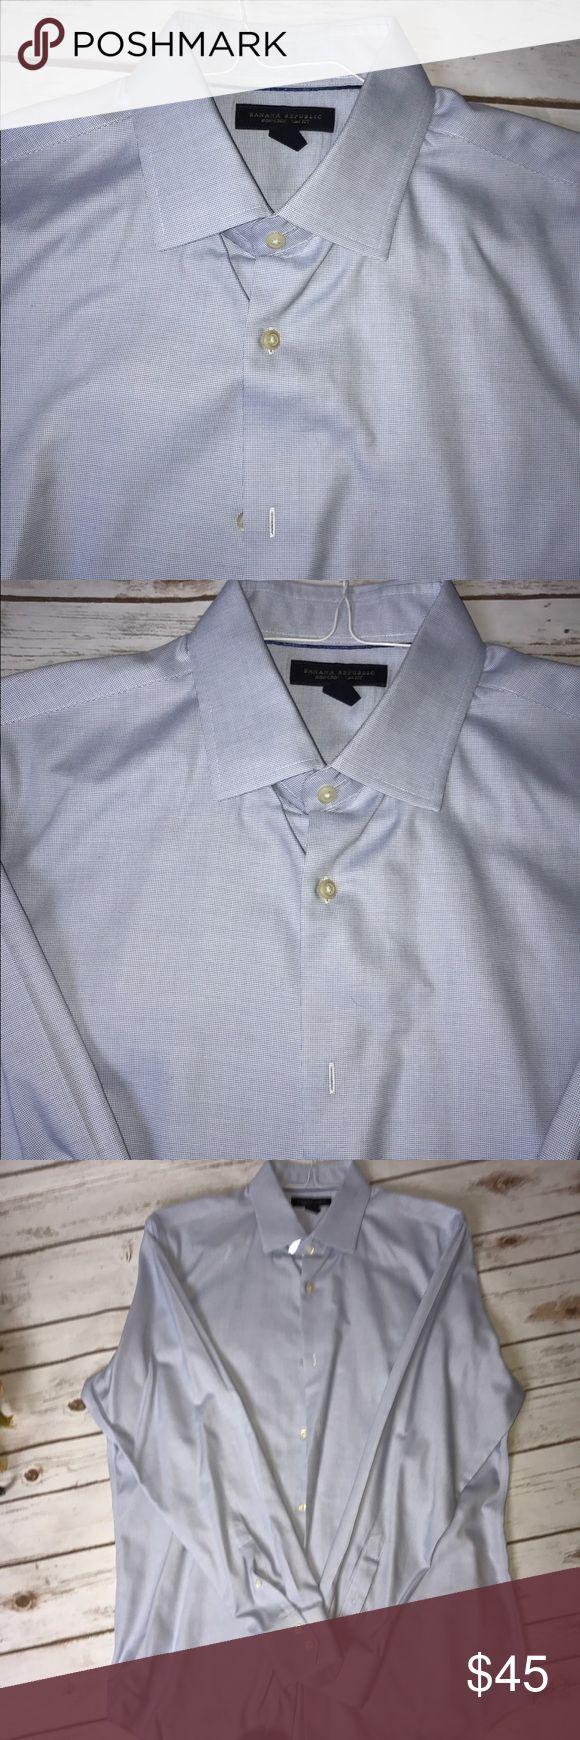 🆕 men's slim fit dress shirt Light powder blue banana republic slim fit dress shirt. Banana Republic Shirts Dress Shirts